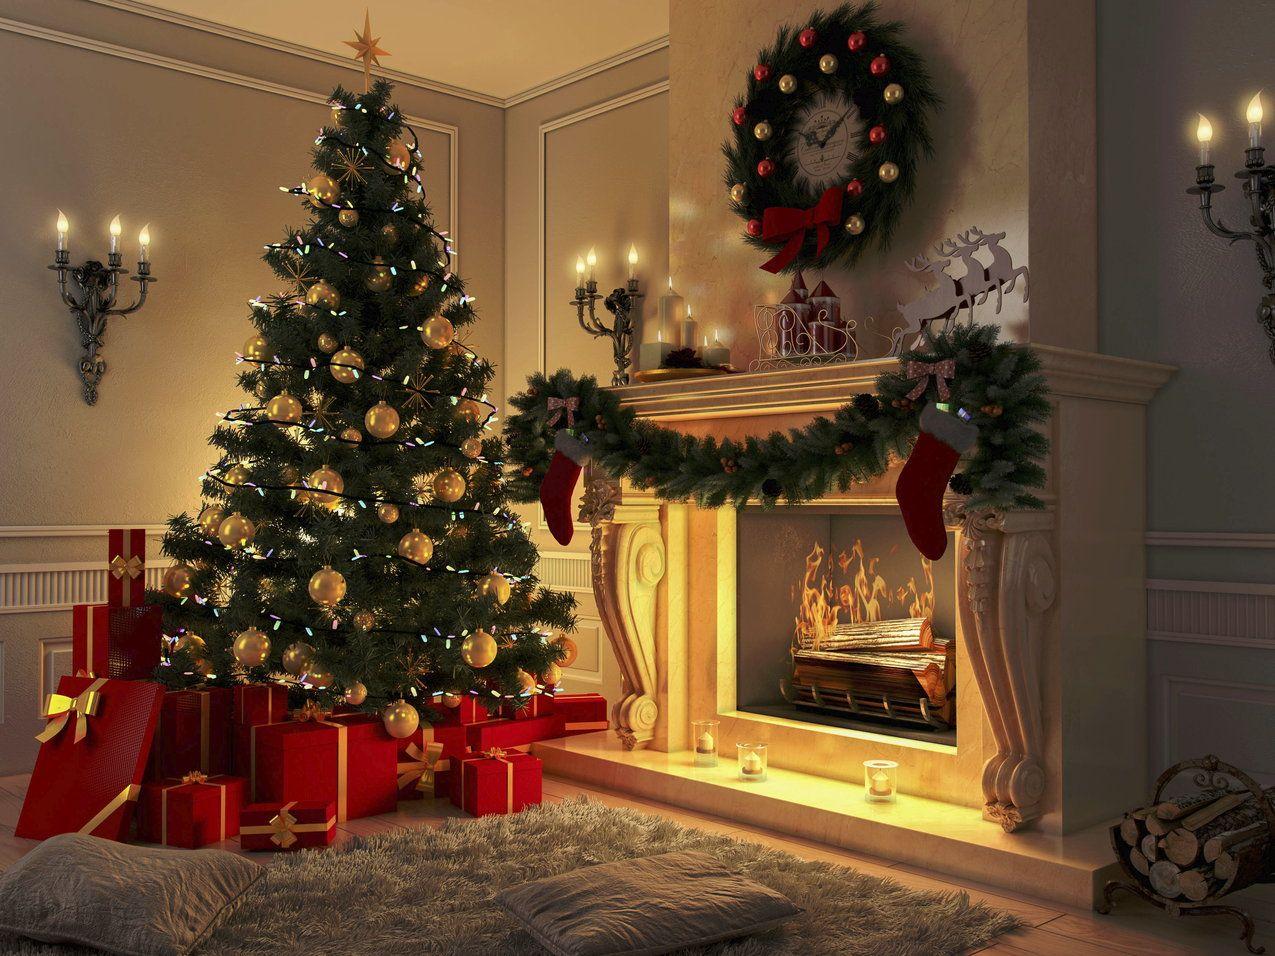 Najpiekniejsze Choinki Na Swiecie Rockefeller Center Rio De Janeiro Christmas Tree And Fireplace Christmas Backdrops Holiday Decor